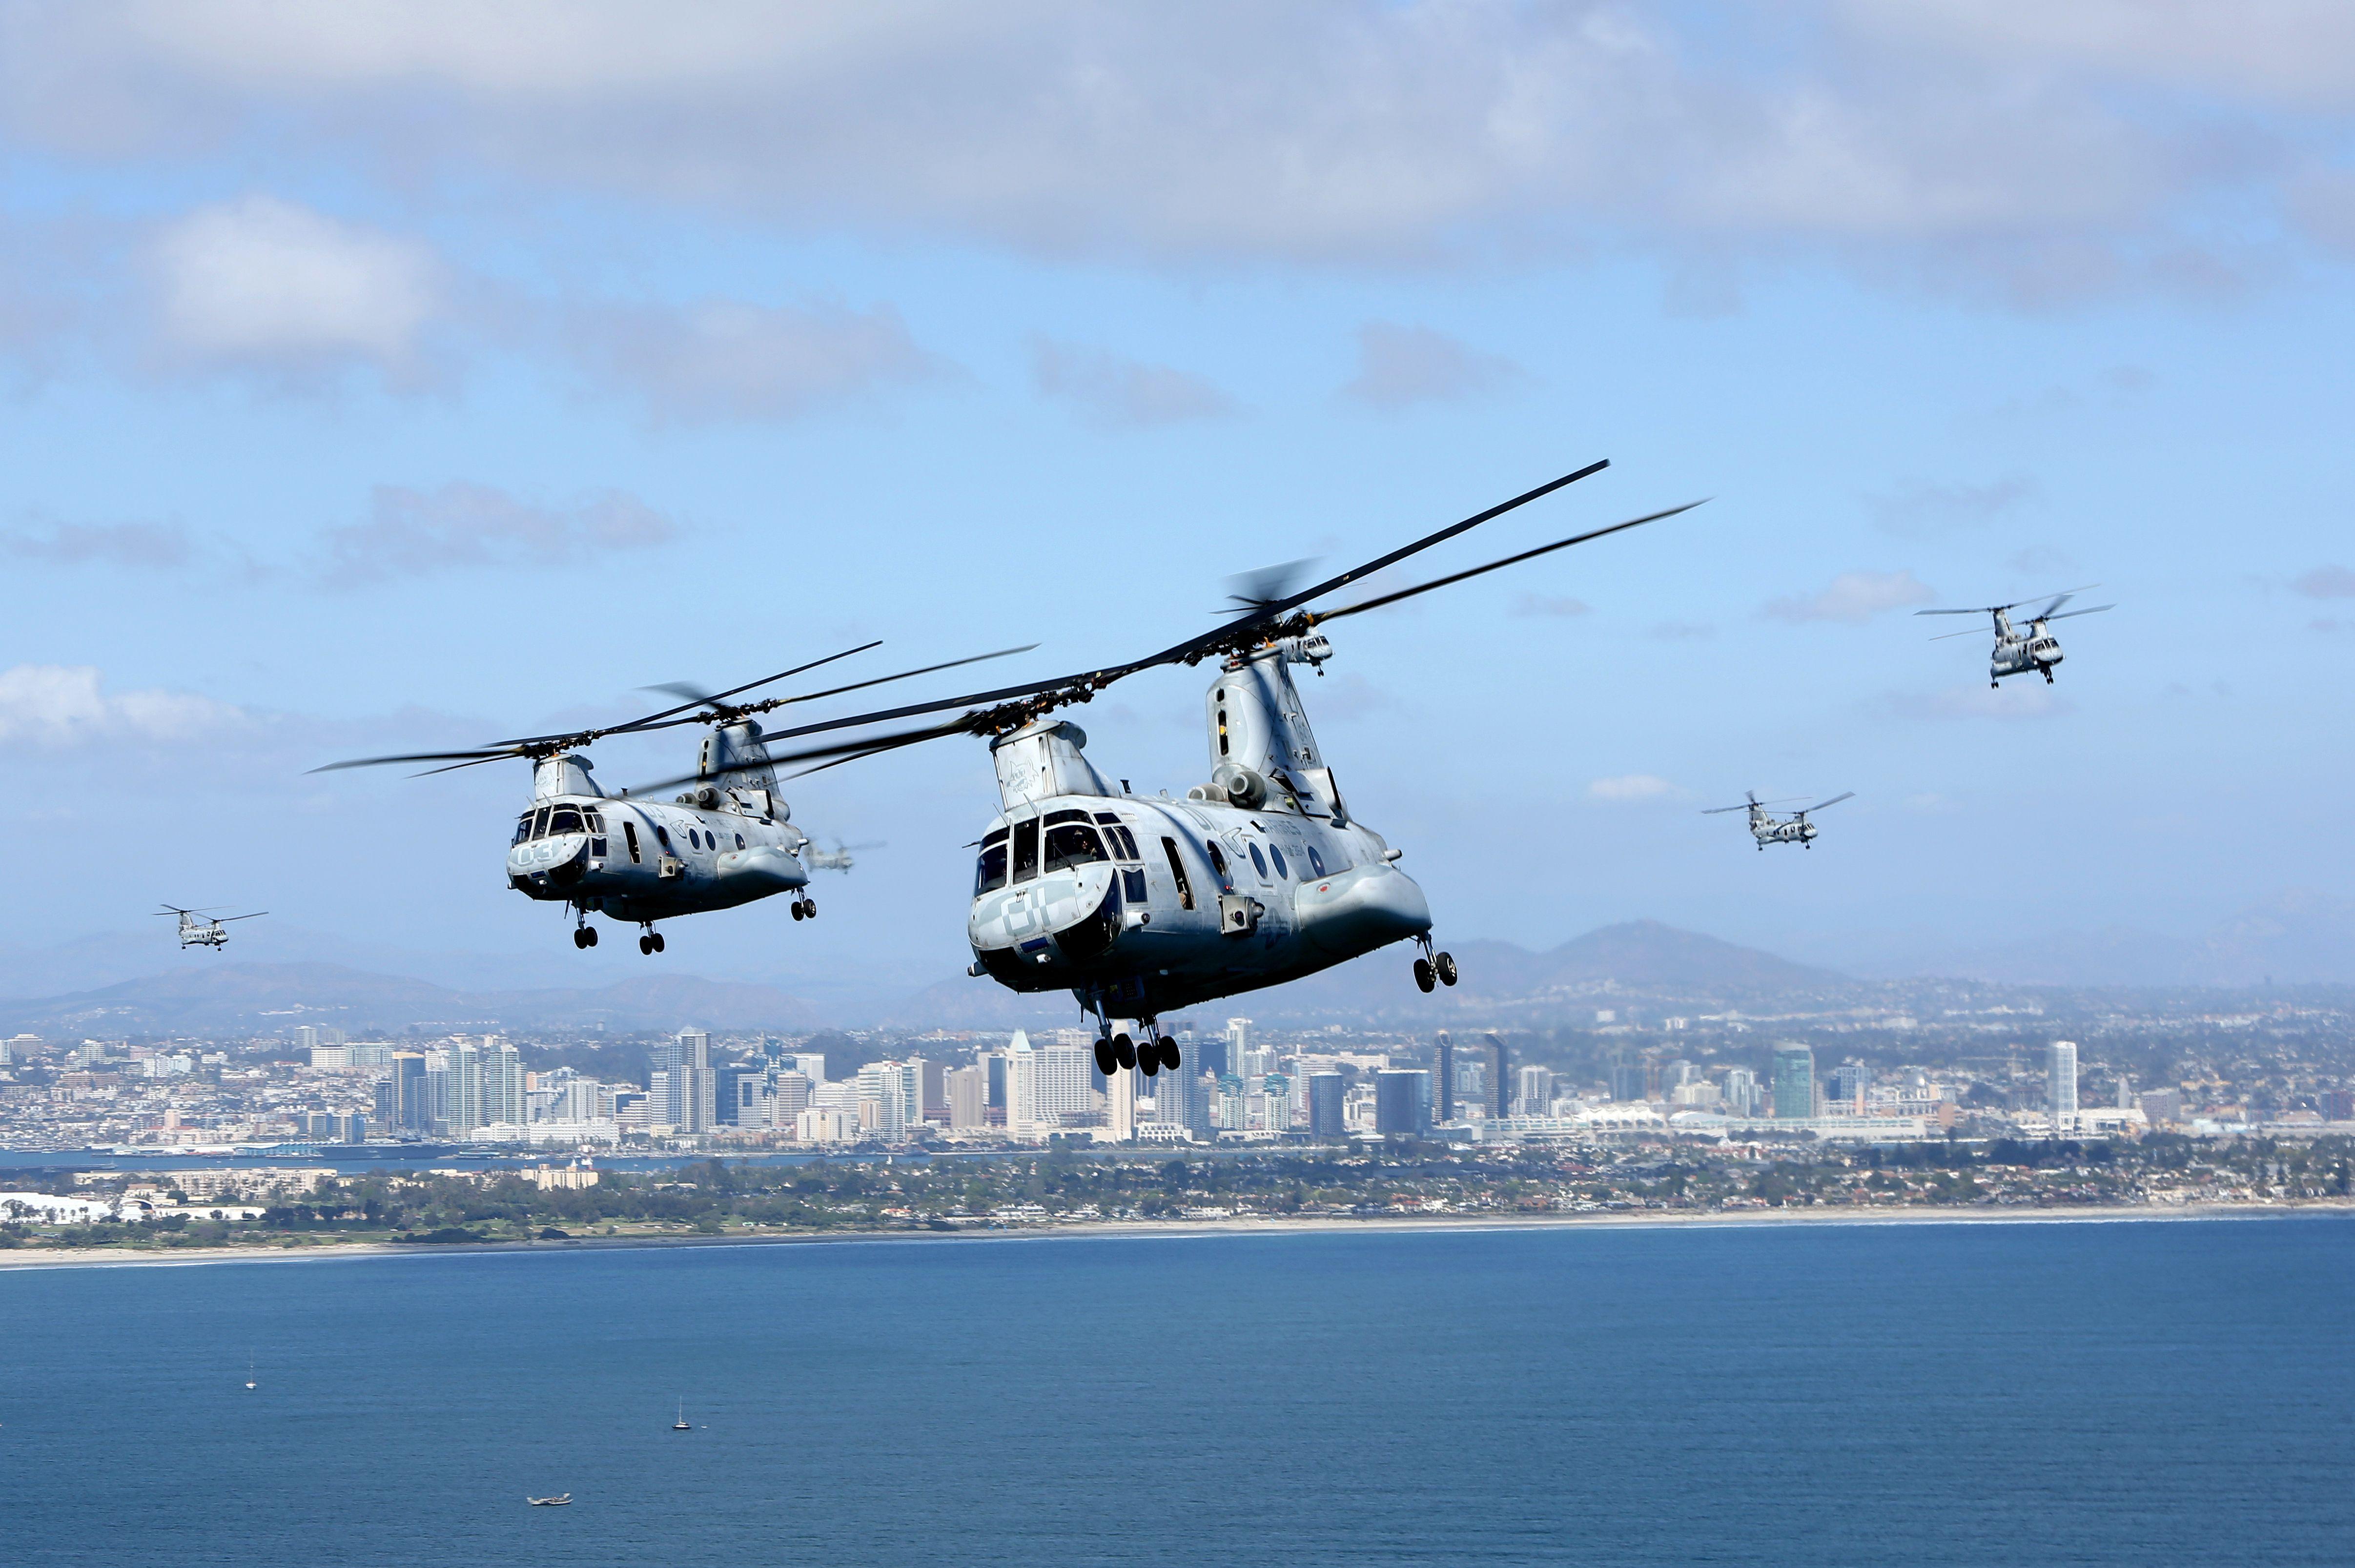 US Marines with Marine Medium Helicopter Squadron 364